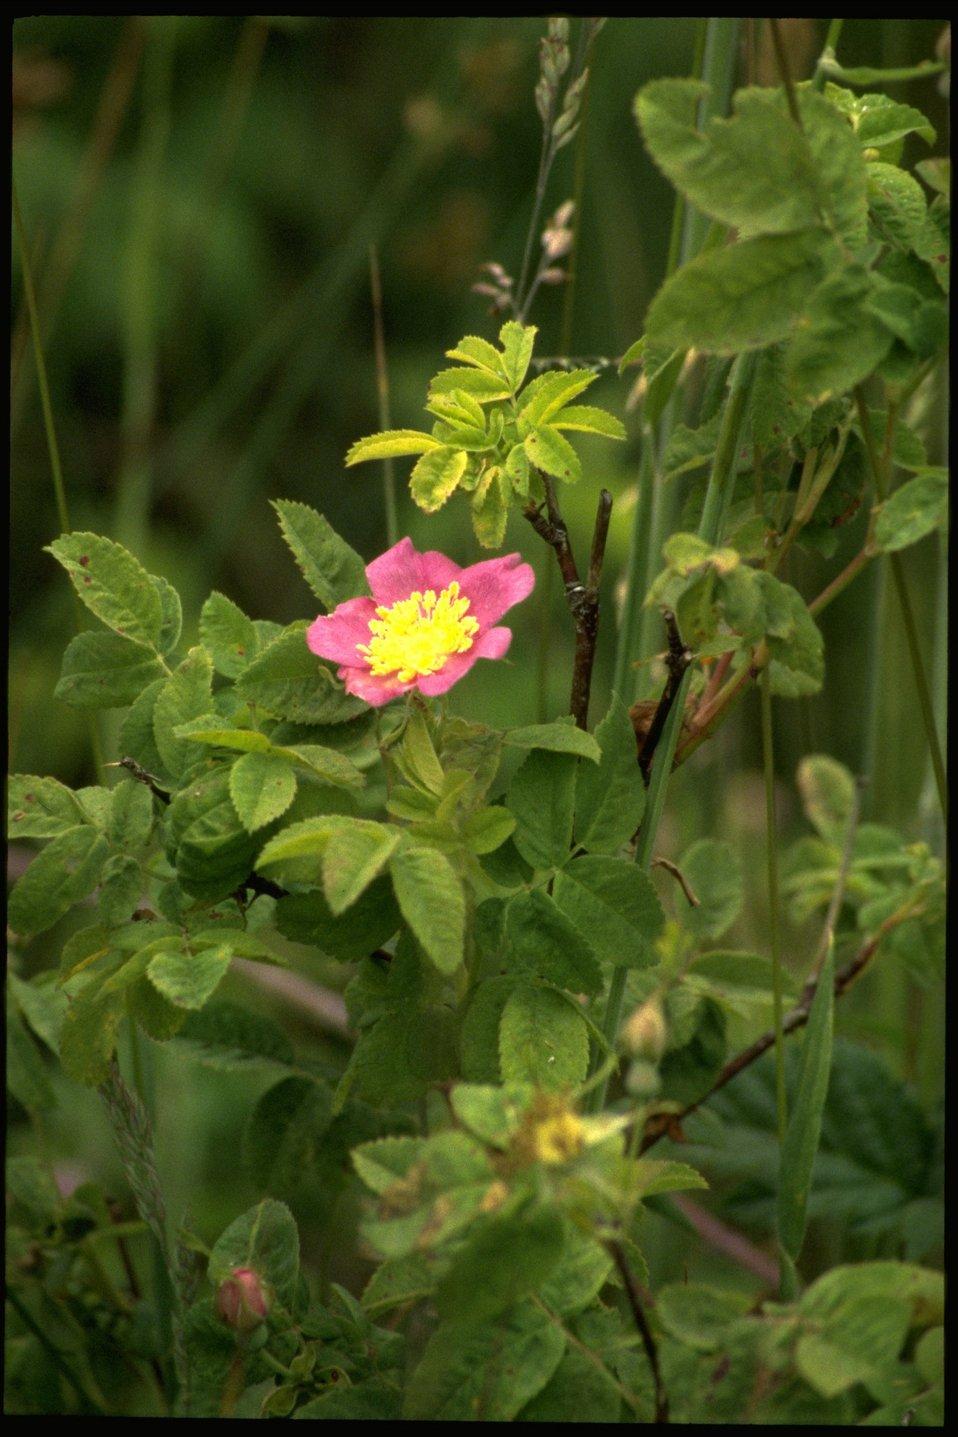 Medium shot of wildflower, genus Rosa.